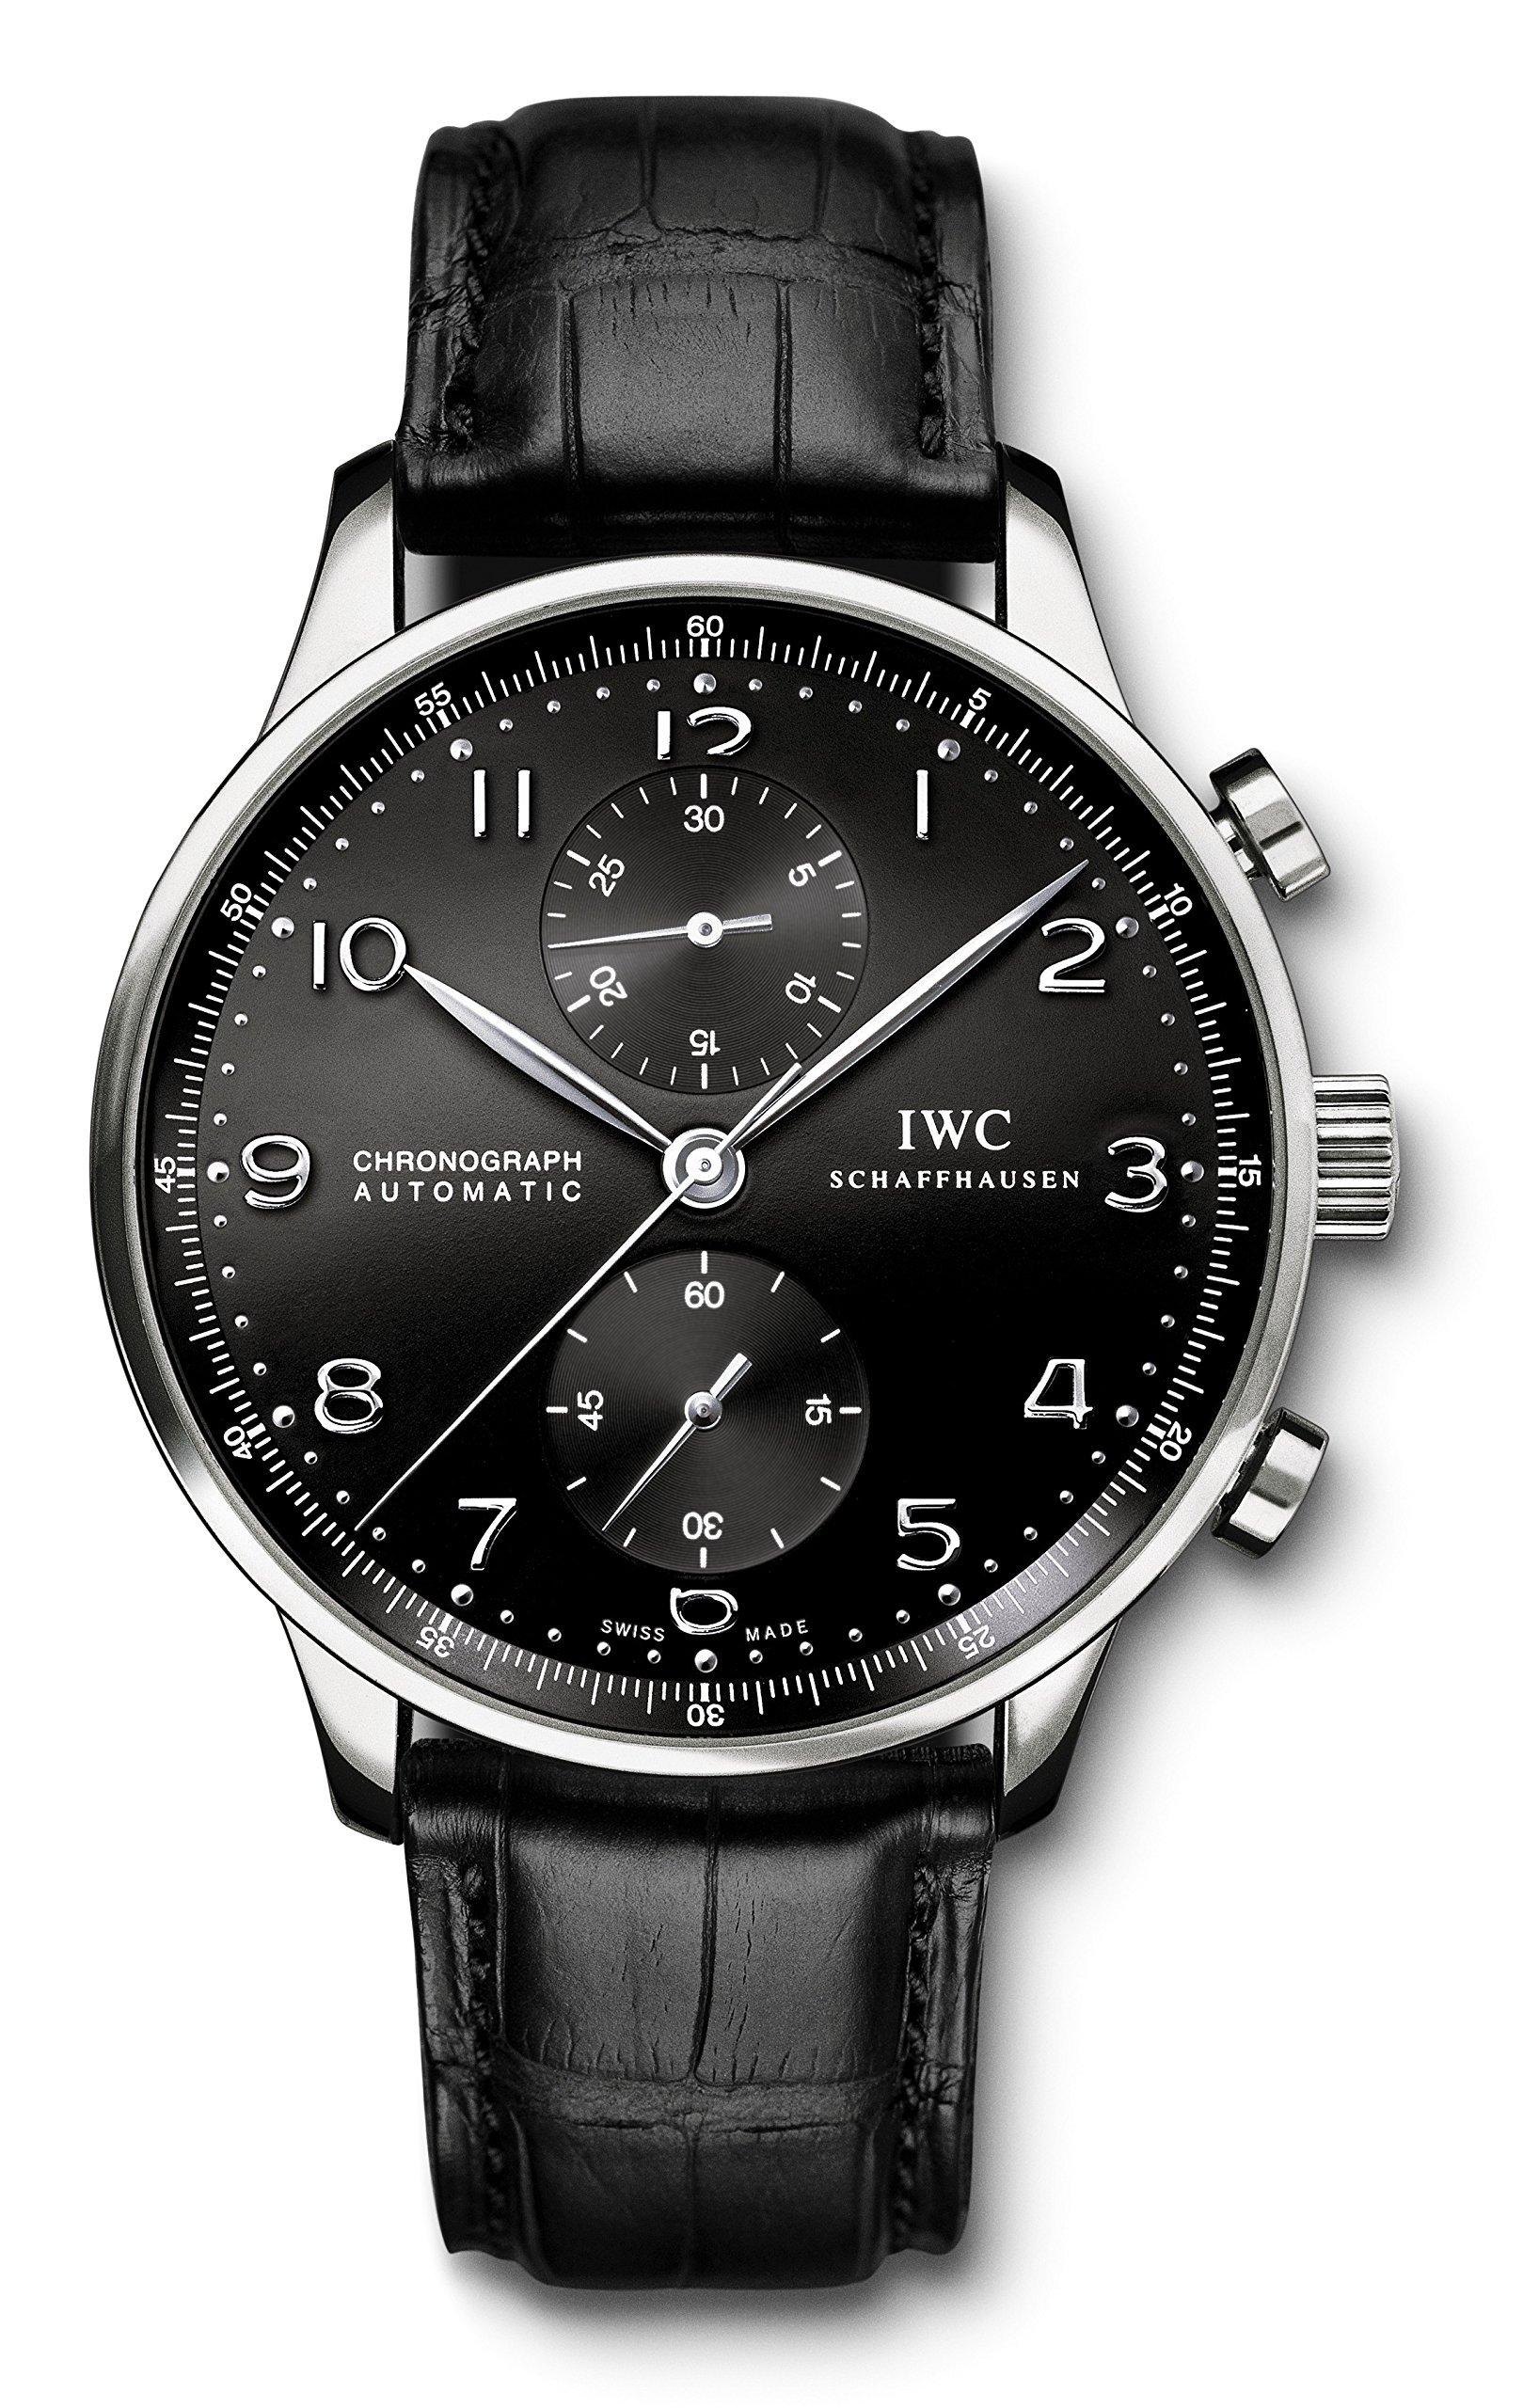 IWC Men's Swiss Quartz Watch with Stainless Steel Strap, Black (Model: IW371447)